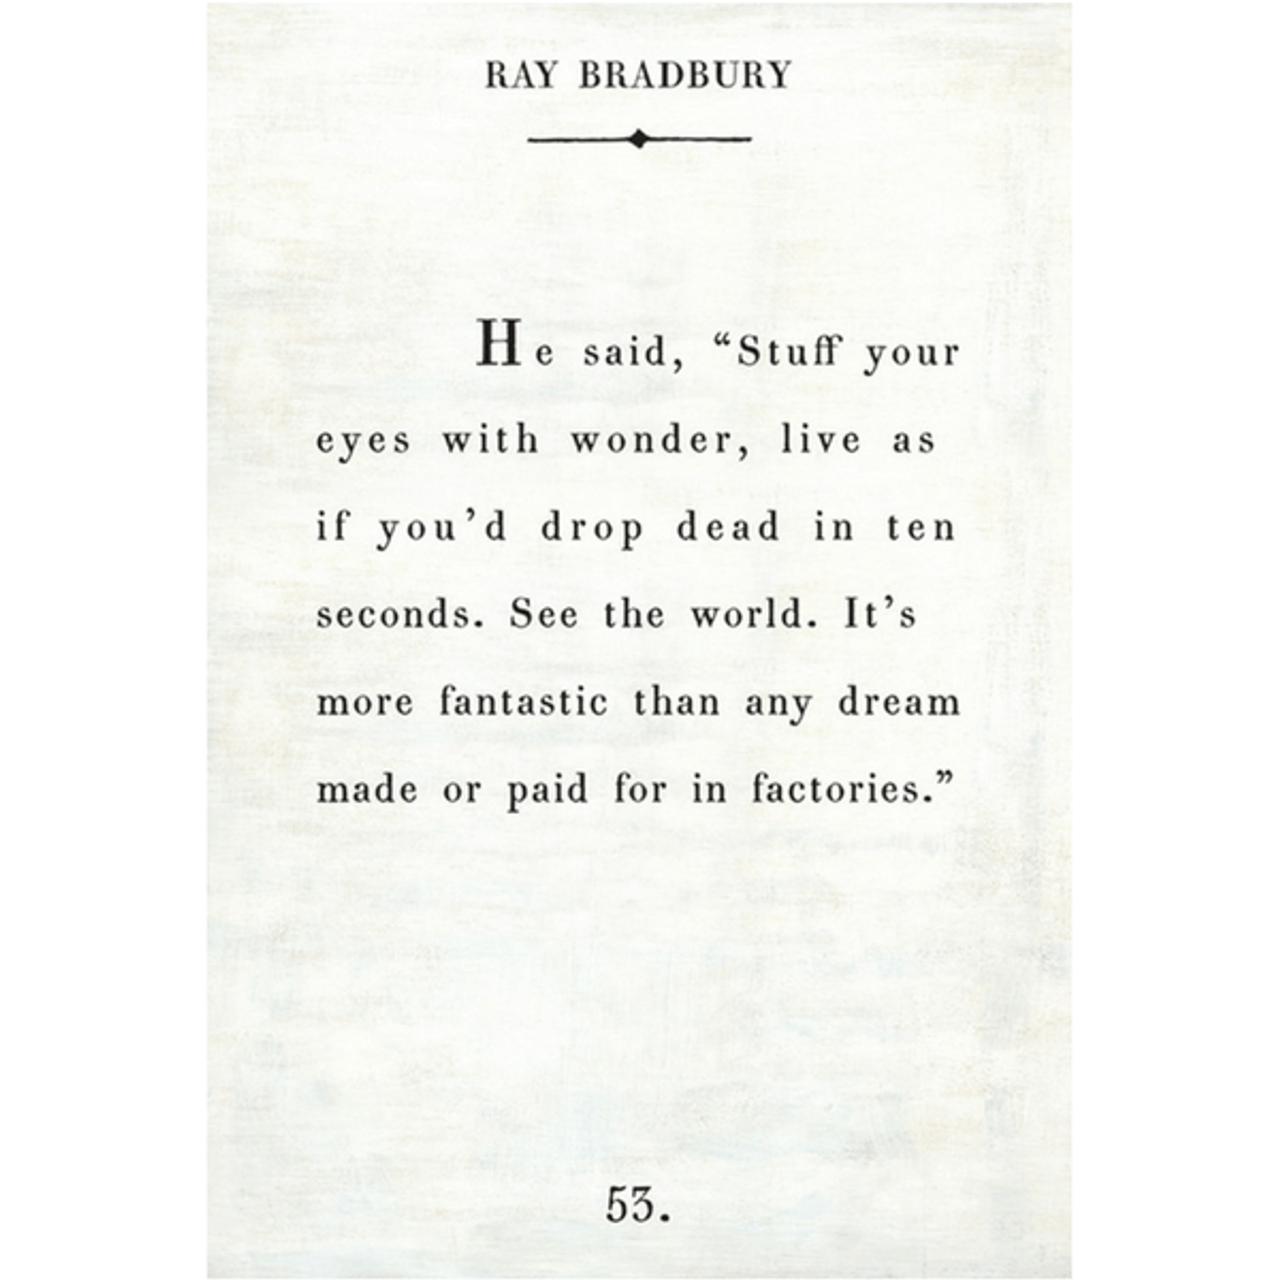 ray bradbury art print - white with gallery wrap frame